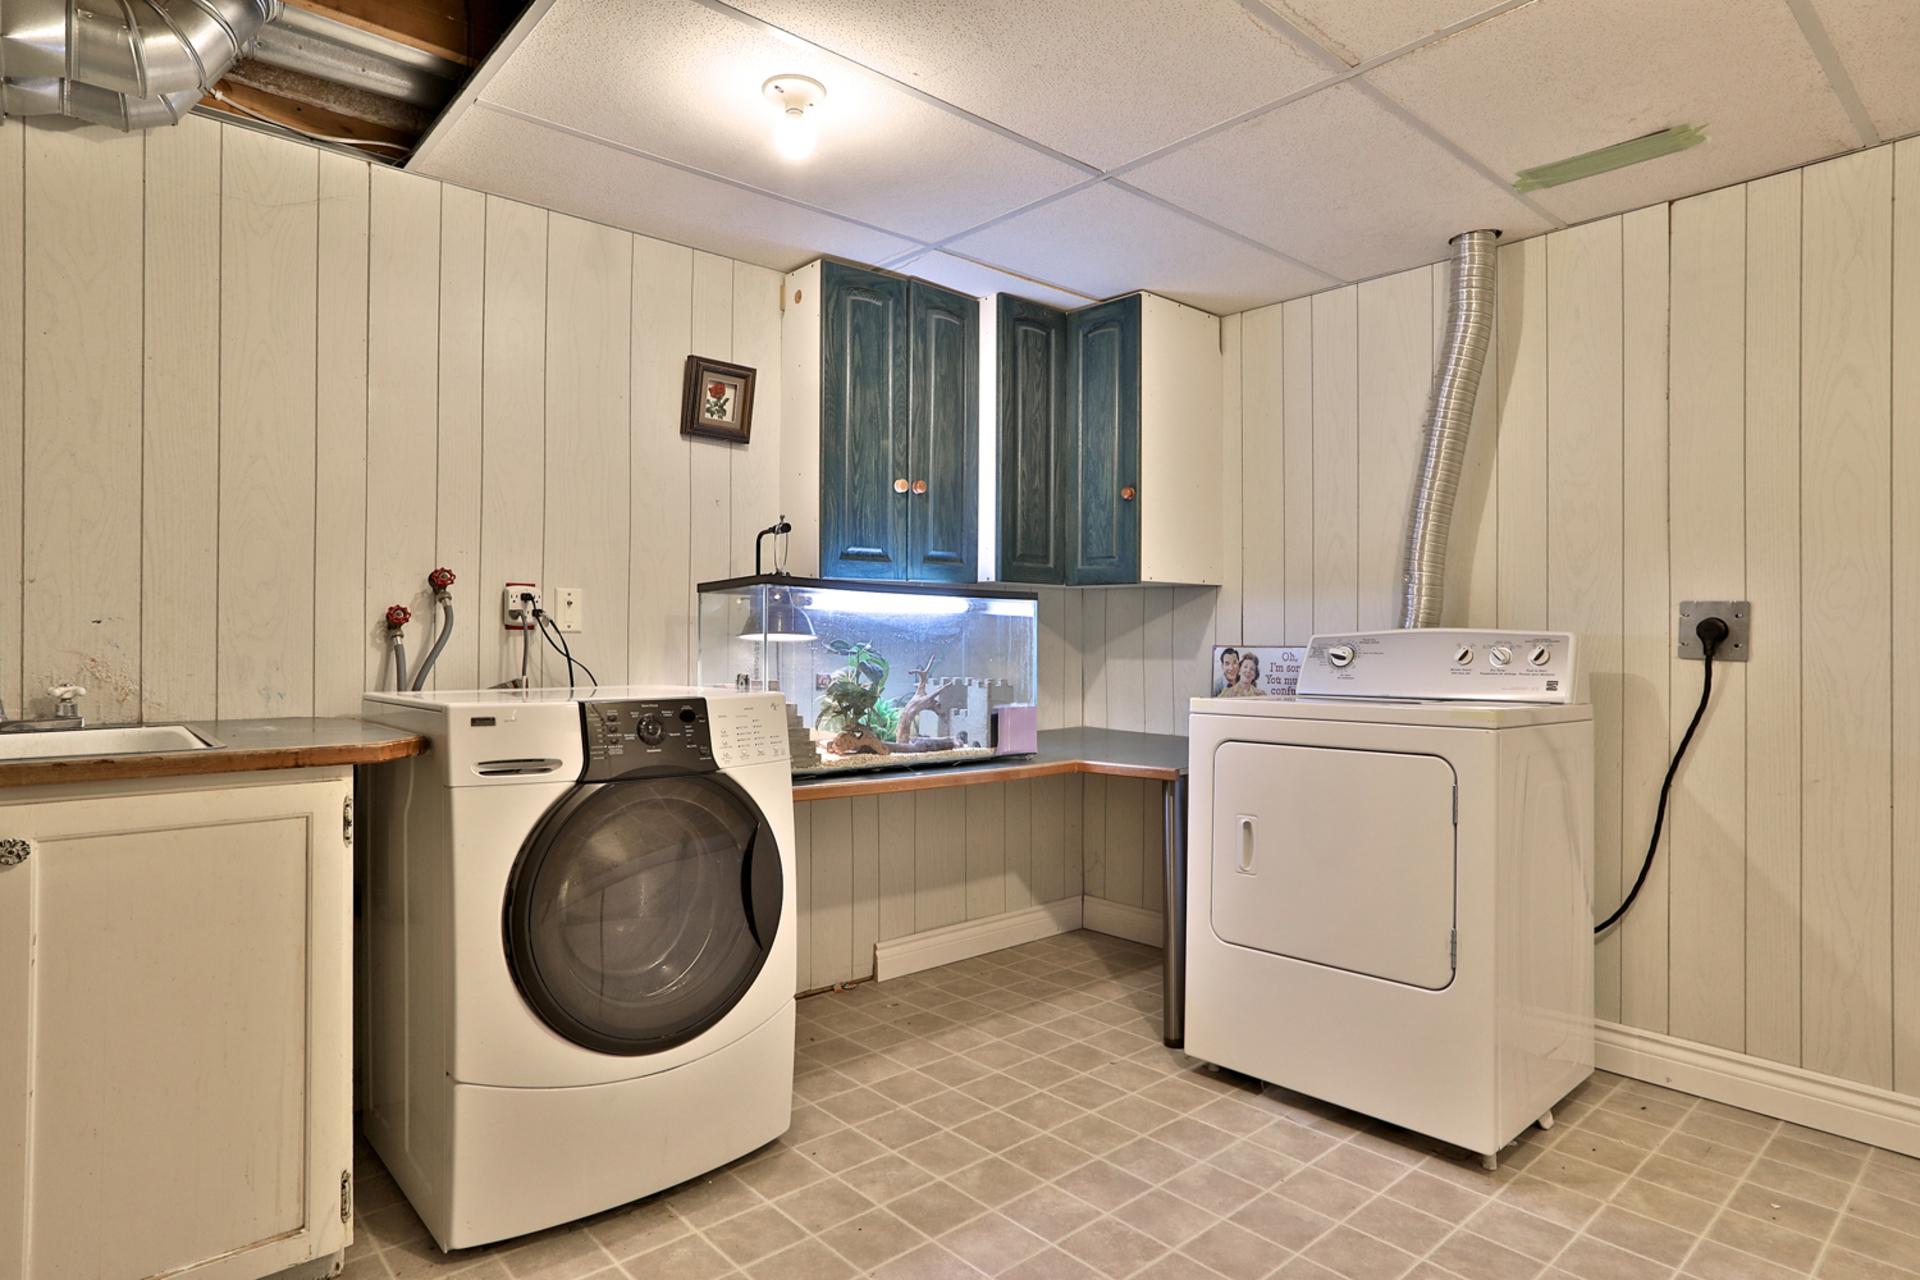 Laundry Room at 32 Geraldine Court, Parkwoods-Donalda, Toronto